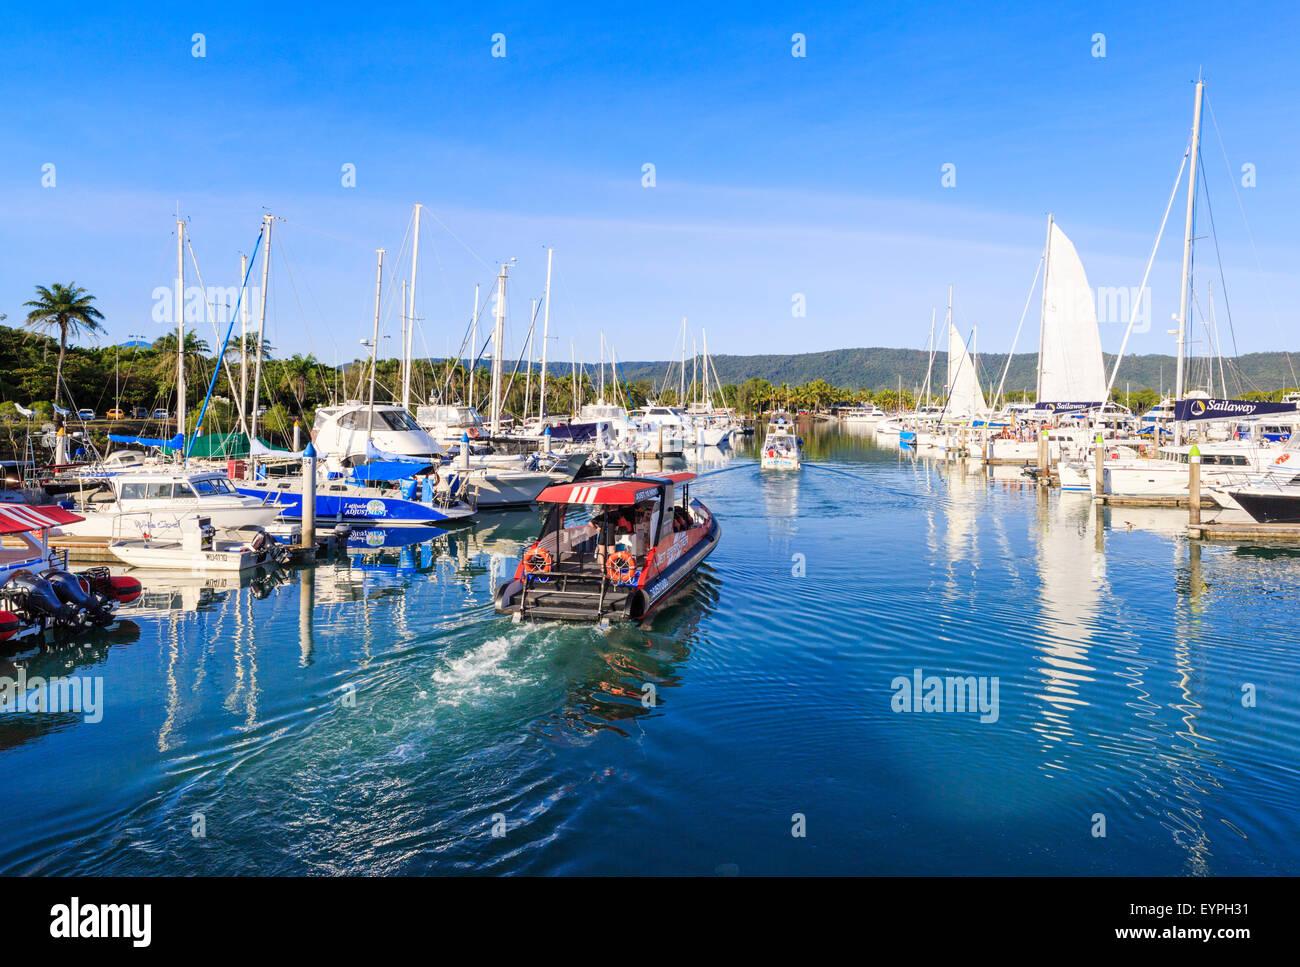 Port Douglas Marina. Queensland, Australia - Stock Image